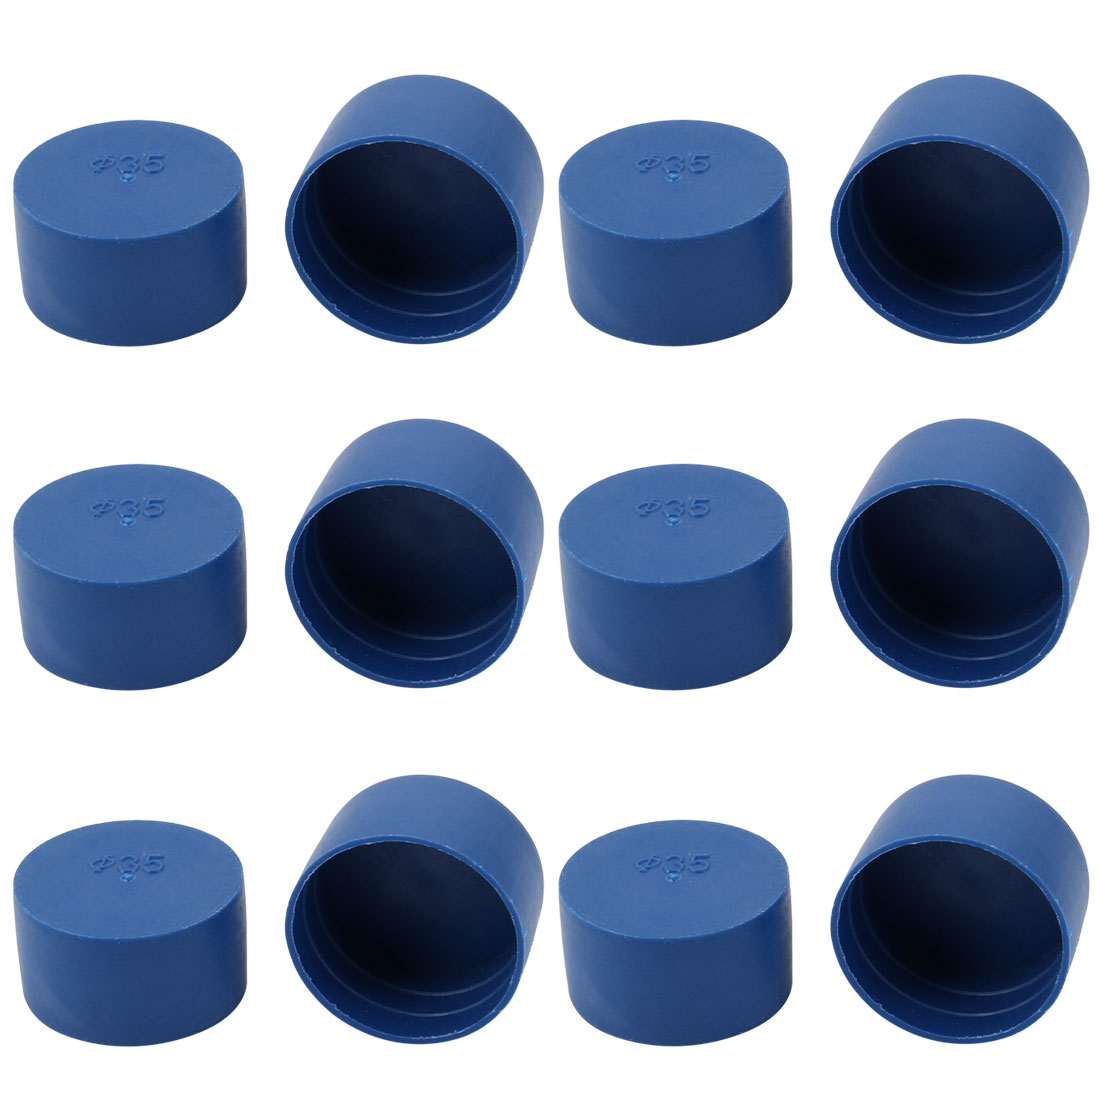 12pcs 35mm Inner Dia PE Plastic End Cap Bolt Thread Protector Tube Cover Blue